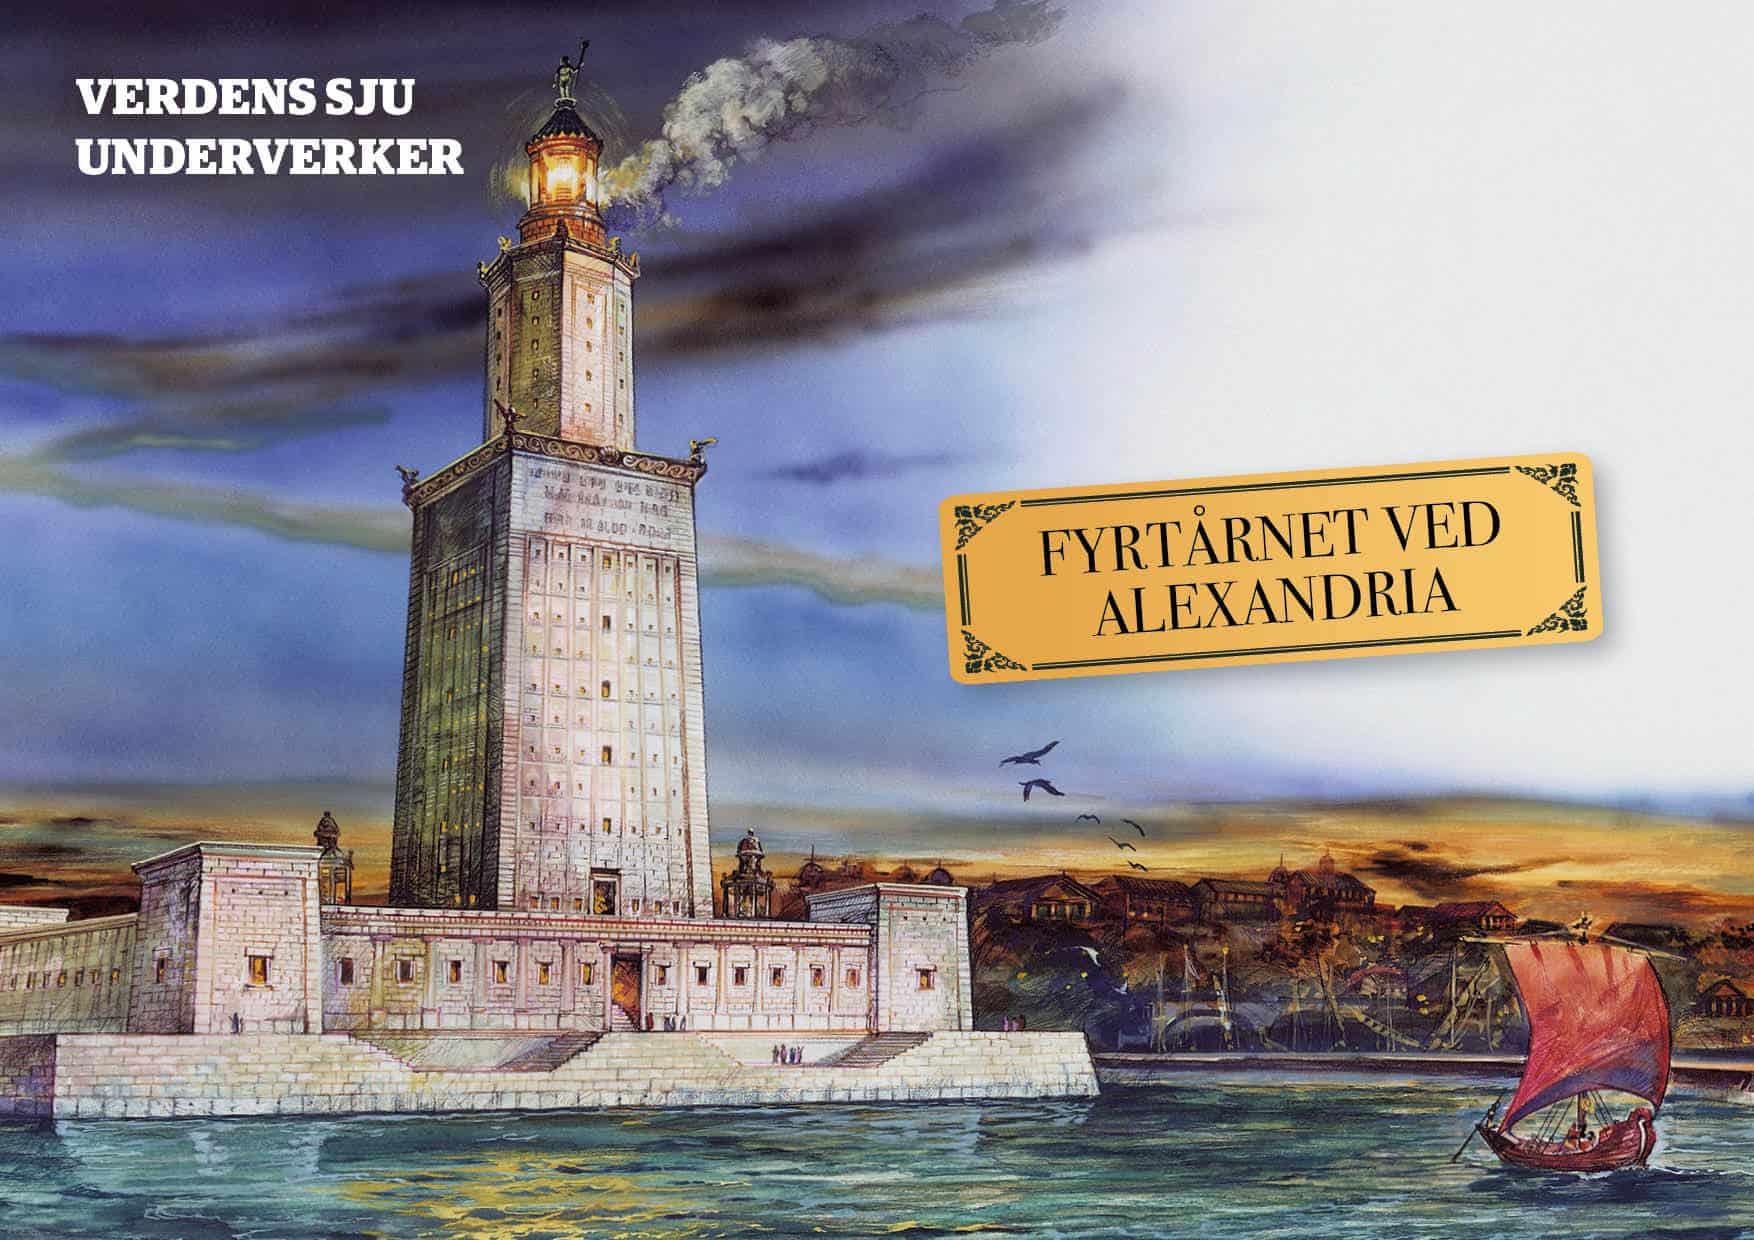 De sju underverker: Fyrtårnet ved Alexandria